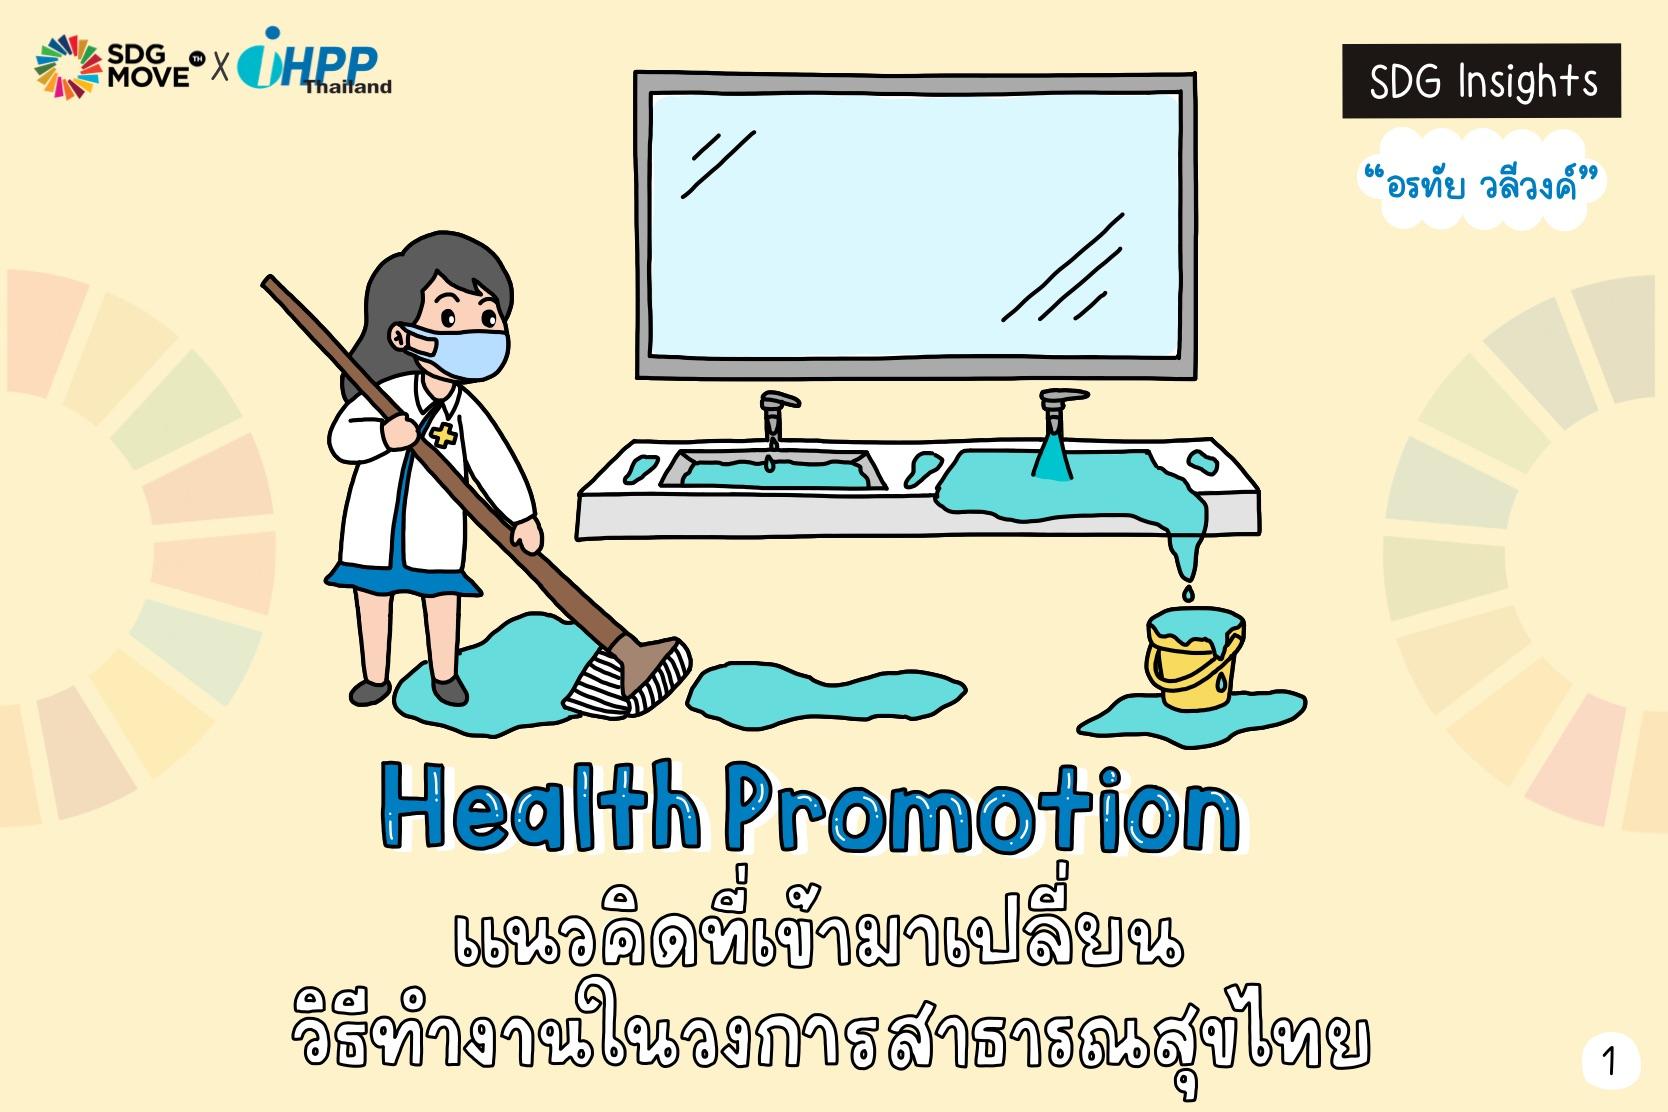 SDG Insights | Health Promotion –  แนวคิดที่เข้ามาเปลี่ยนวิธีทำงานในวงการสาธารณสุขไทย